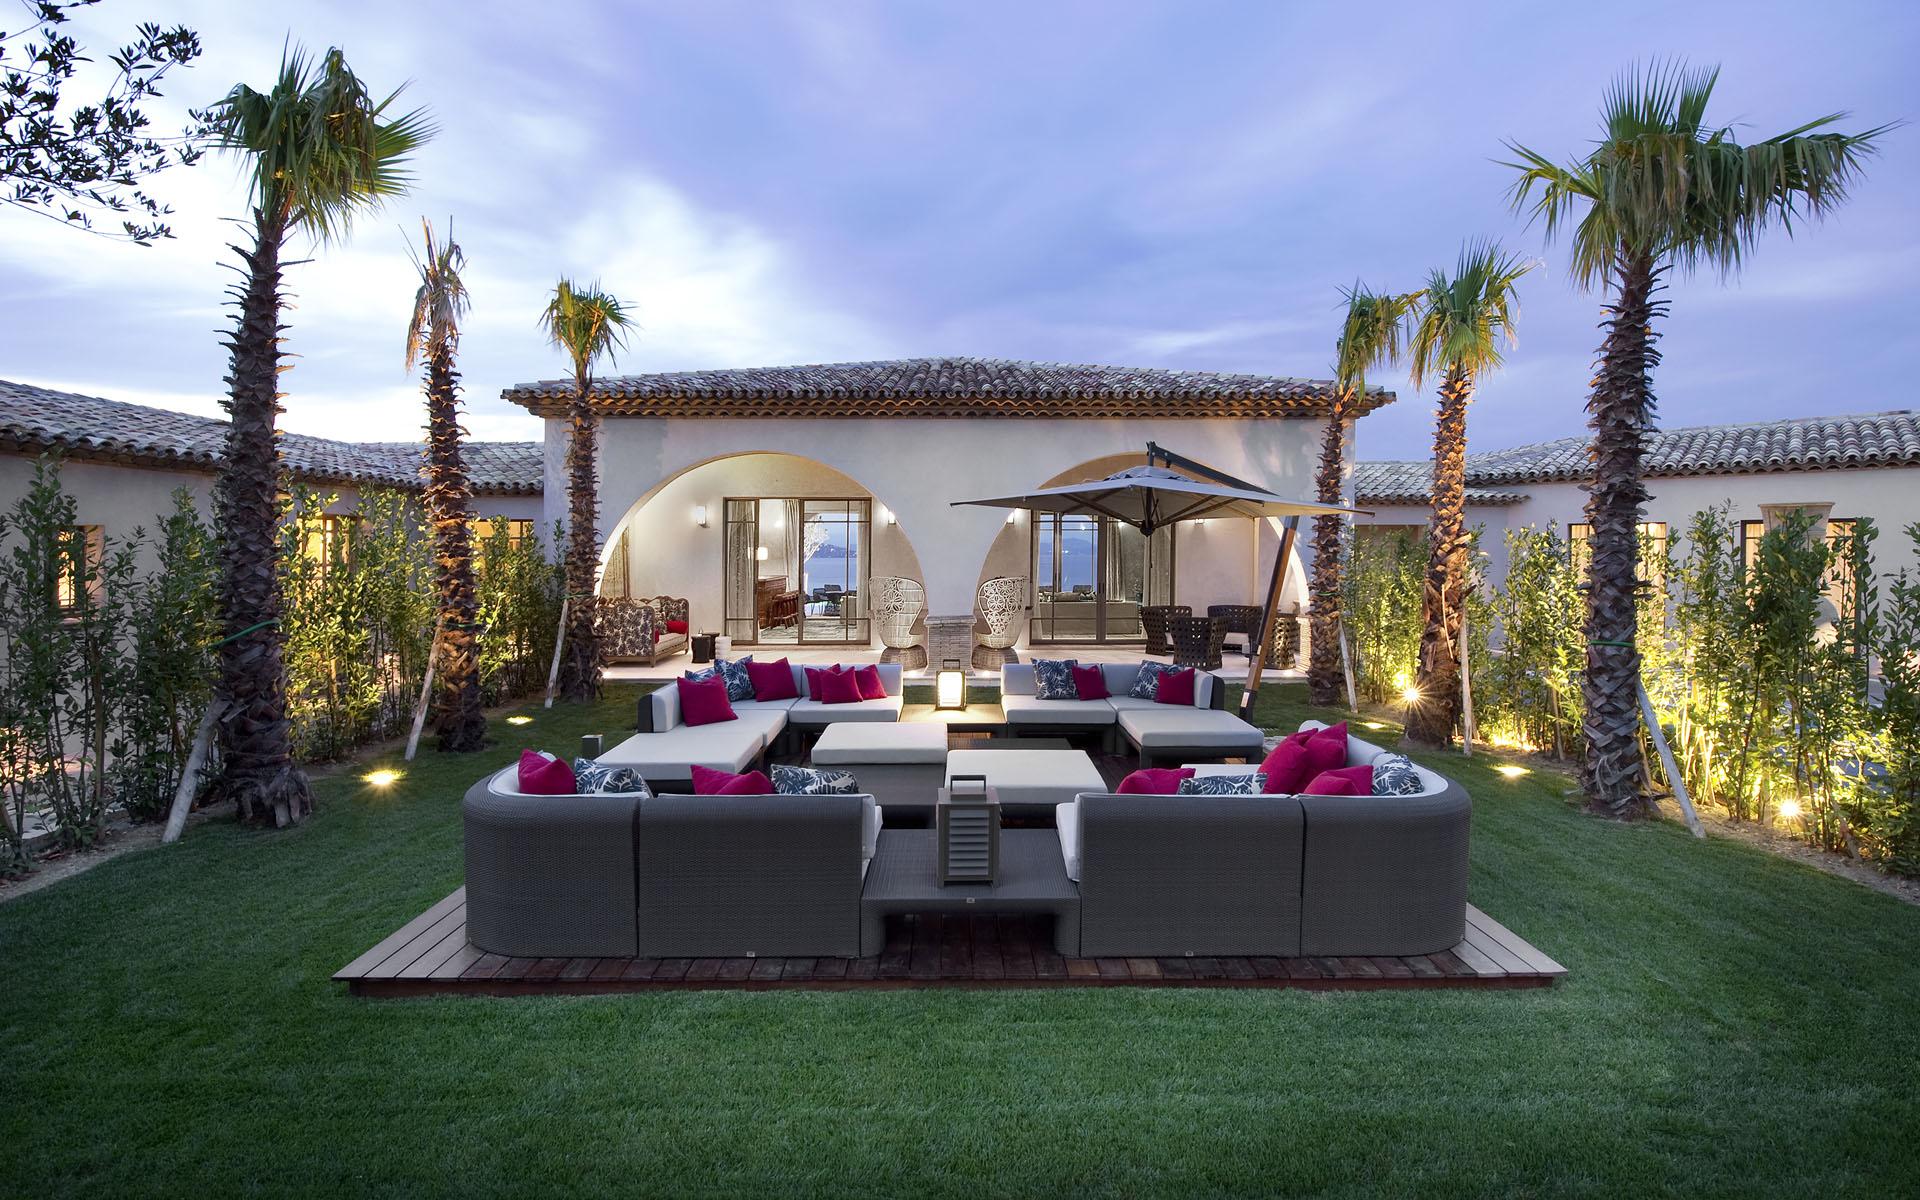 35 Modern Villa Design That Will Amaze You - The WoW Style on Luxury Backyard Design id=85334